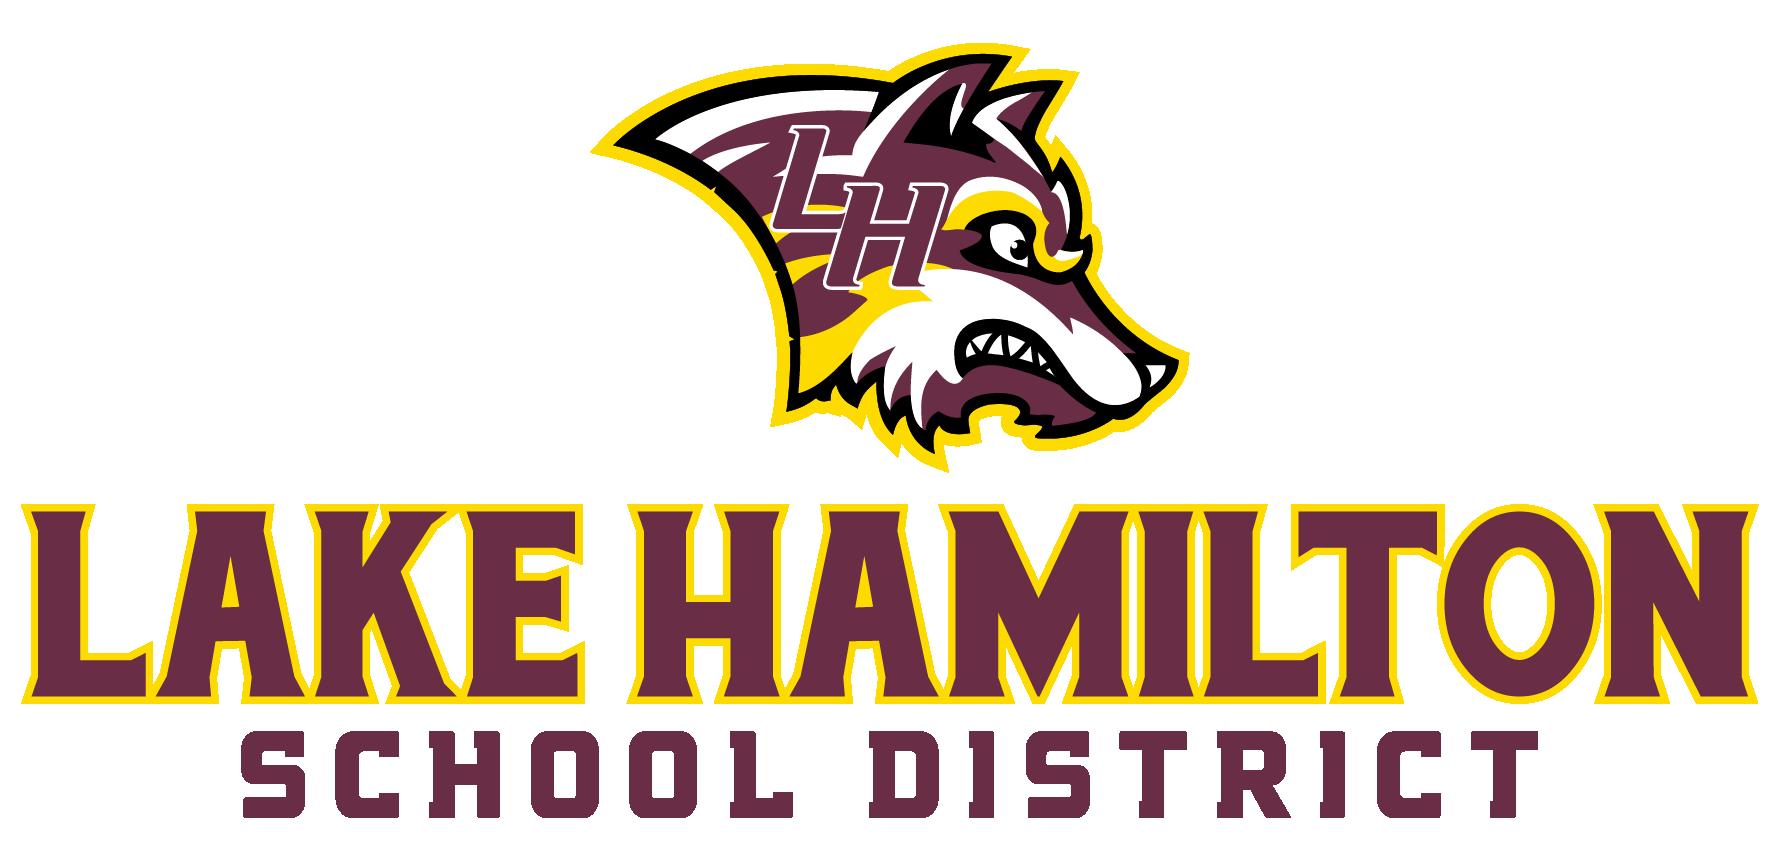 Lake Hamilton School District logo.